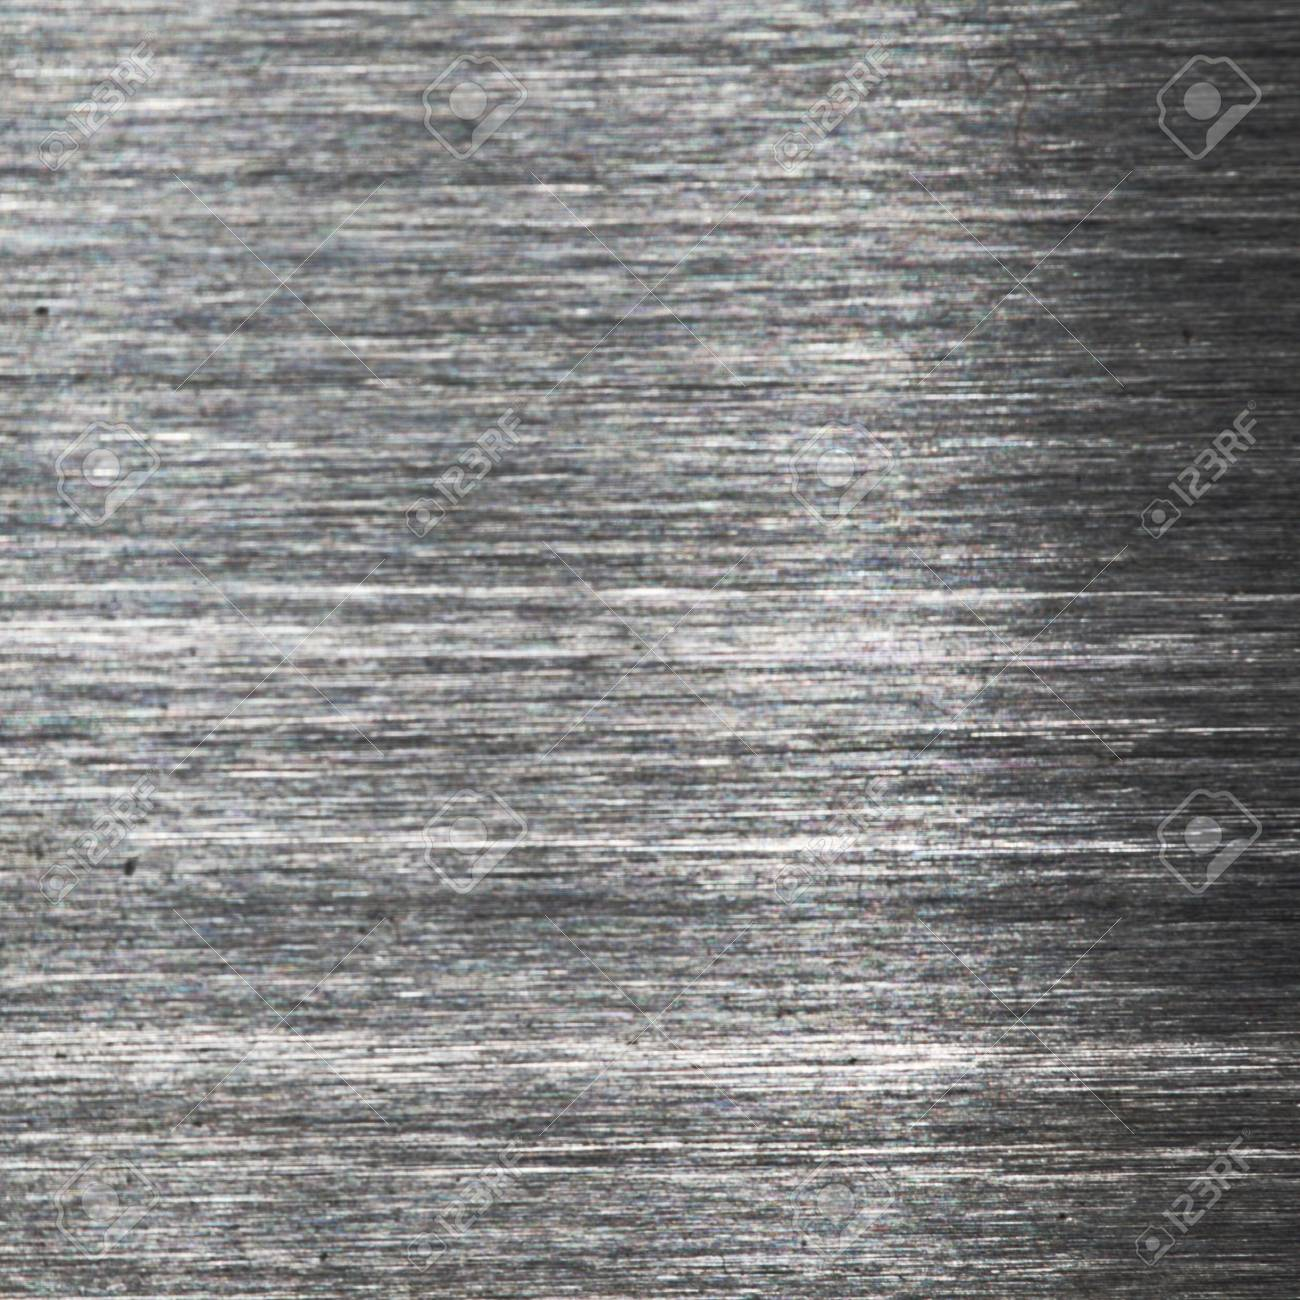 aluminium metal background close up Stock Photo - 8415628